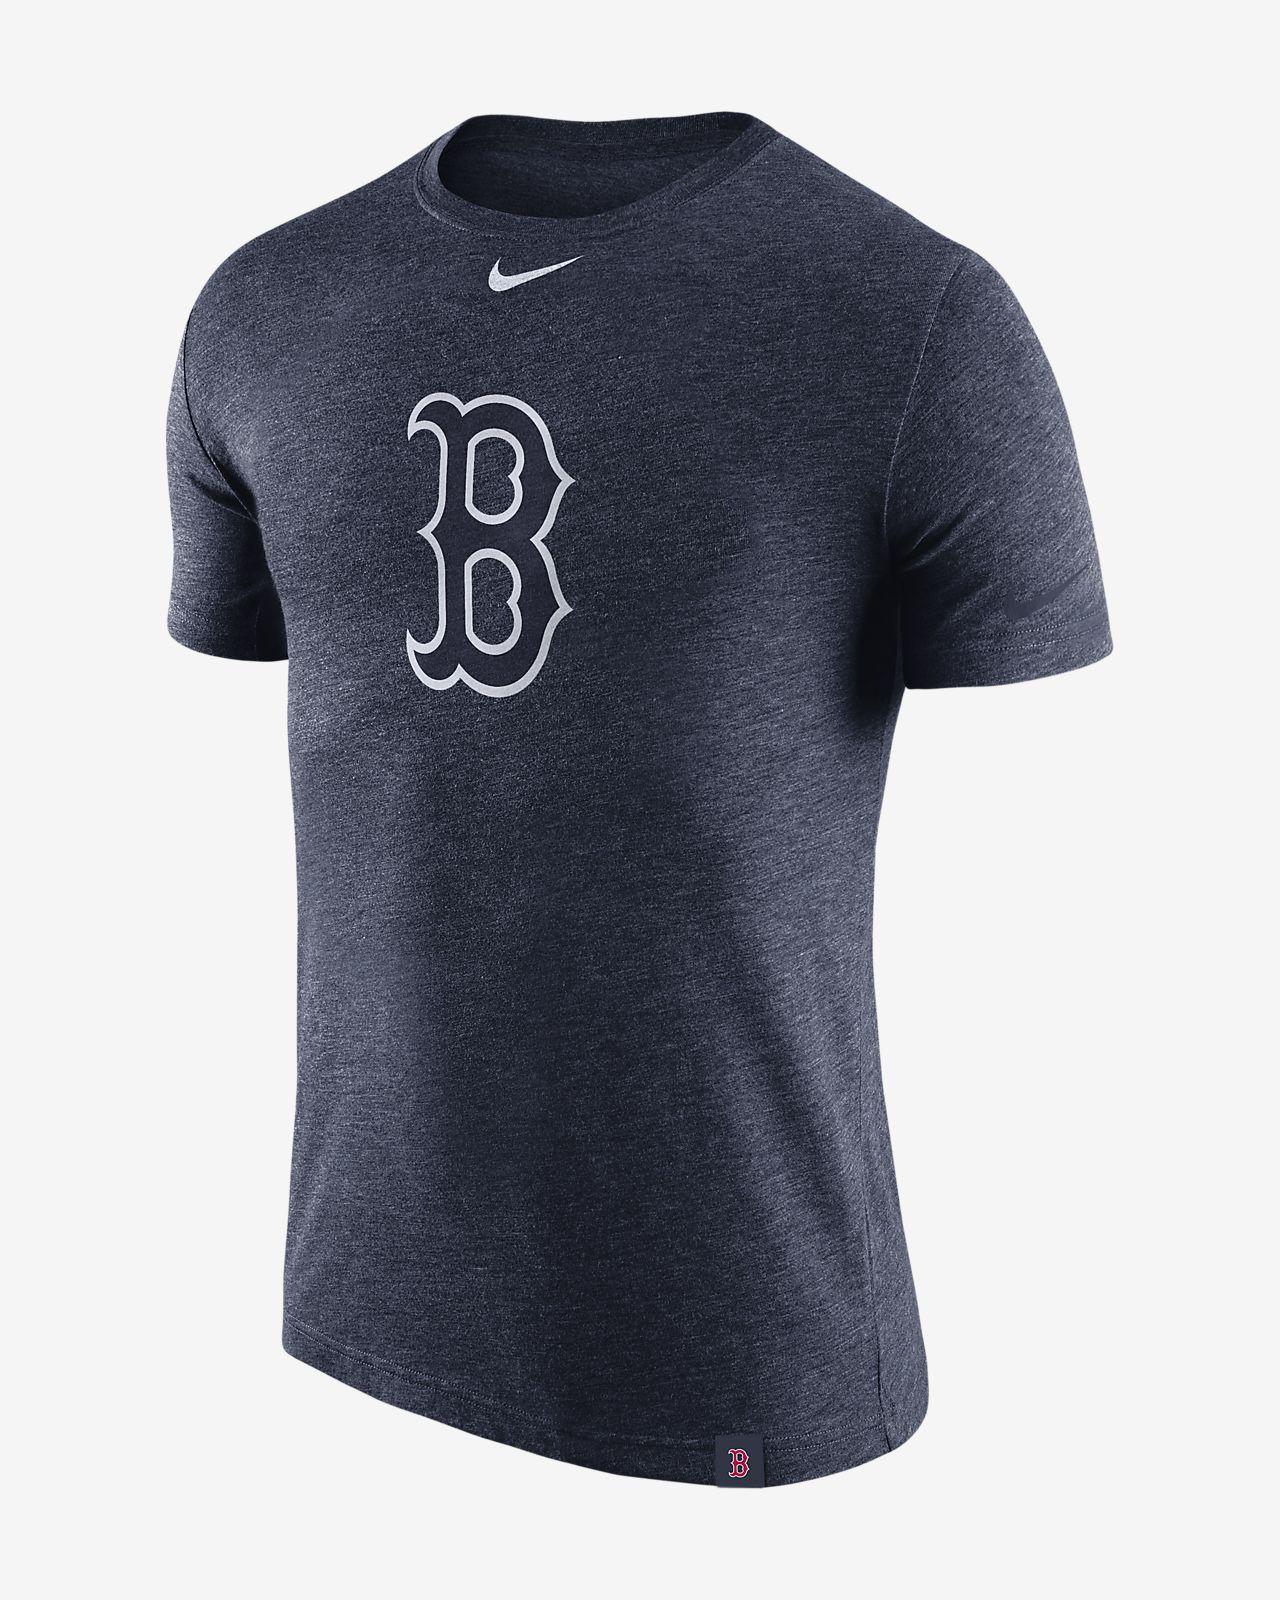 Nike Marled (MLB Red Sox) Men's T-Shirts Navy